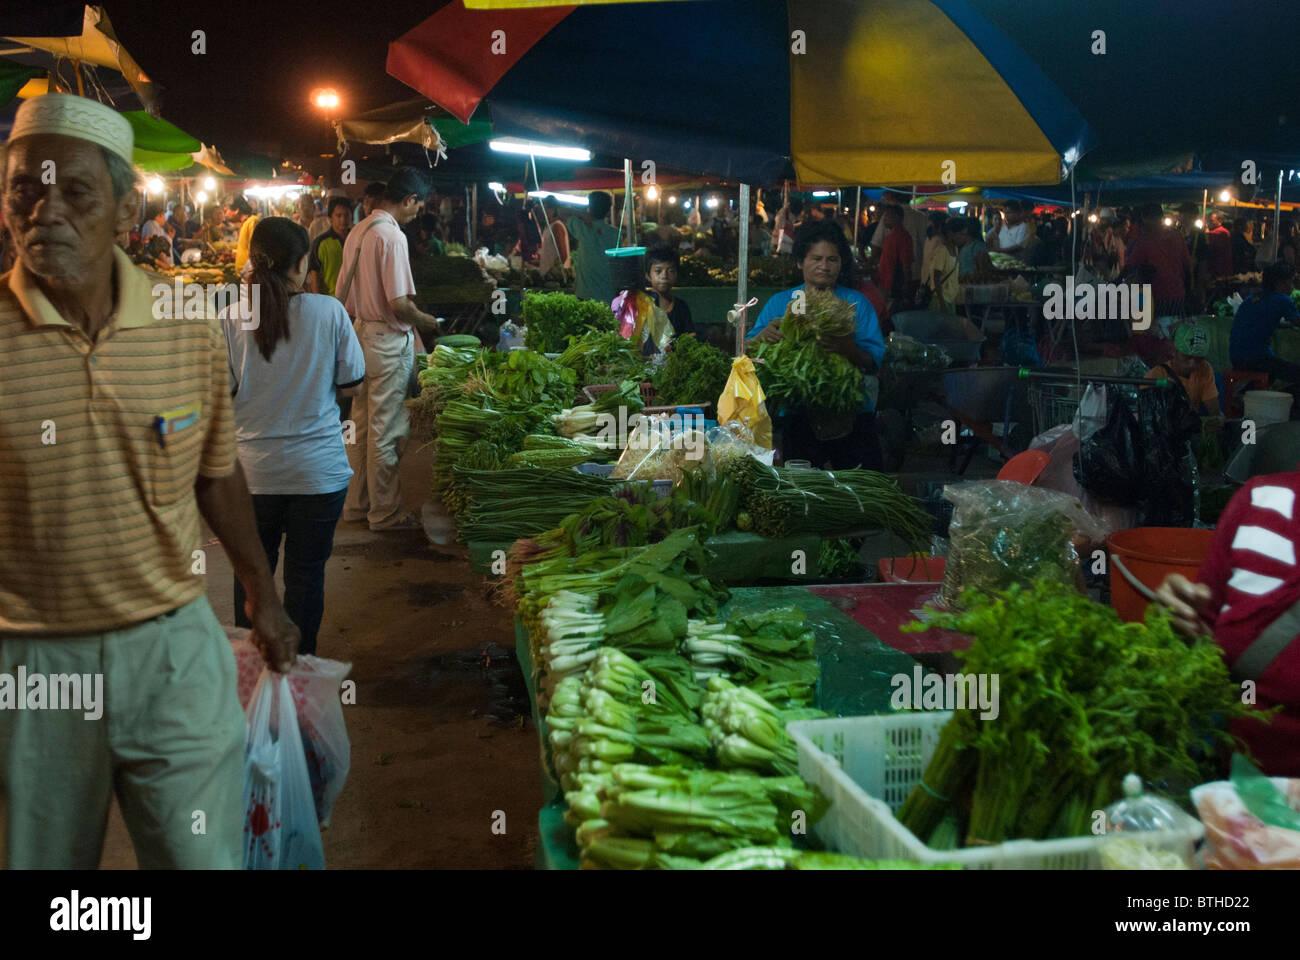 Filipino street market Kota Kinabalu Borneo - Stock Image